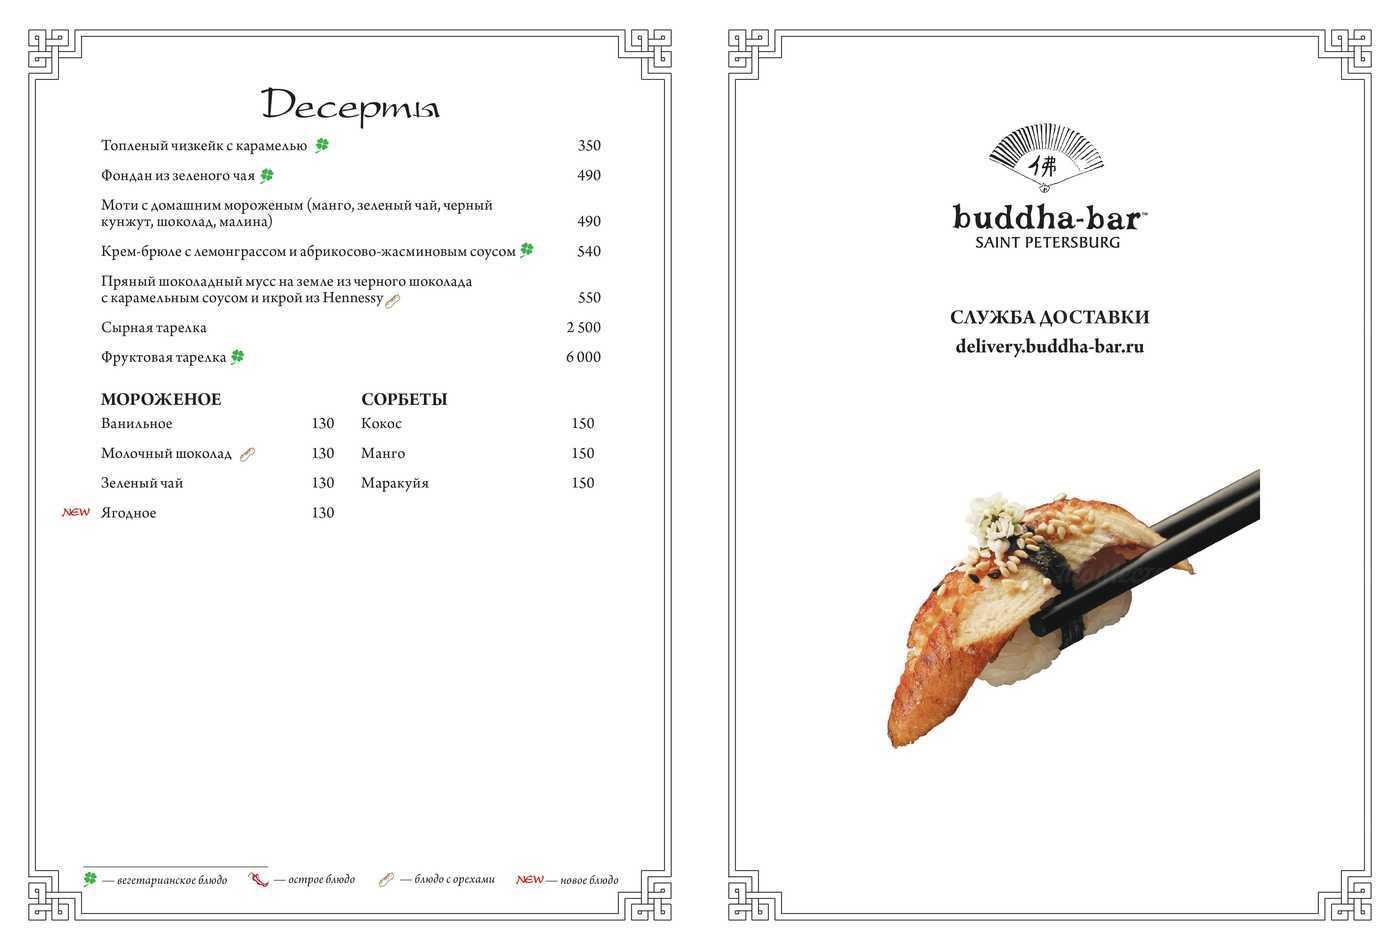 Меню ресторана Будда Бар (Buddha-Bar) на Синопской набережной фото 6